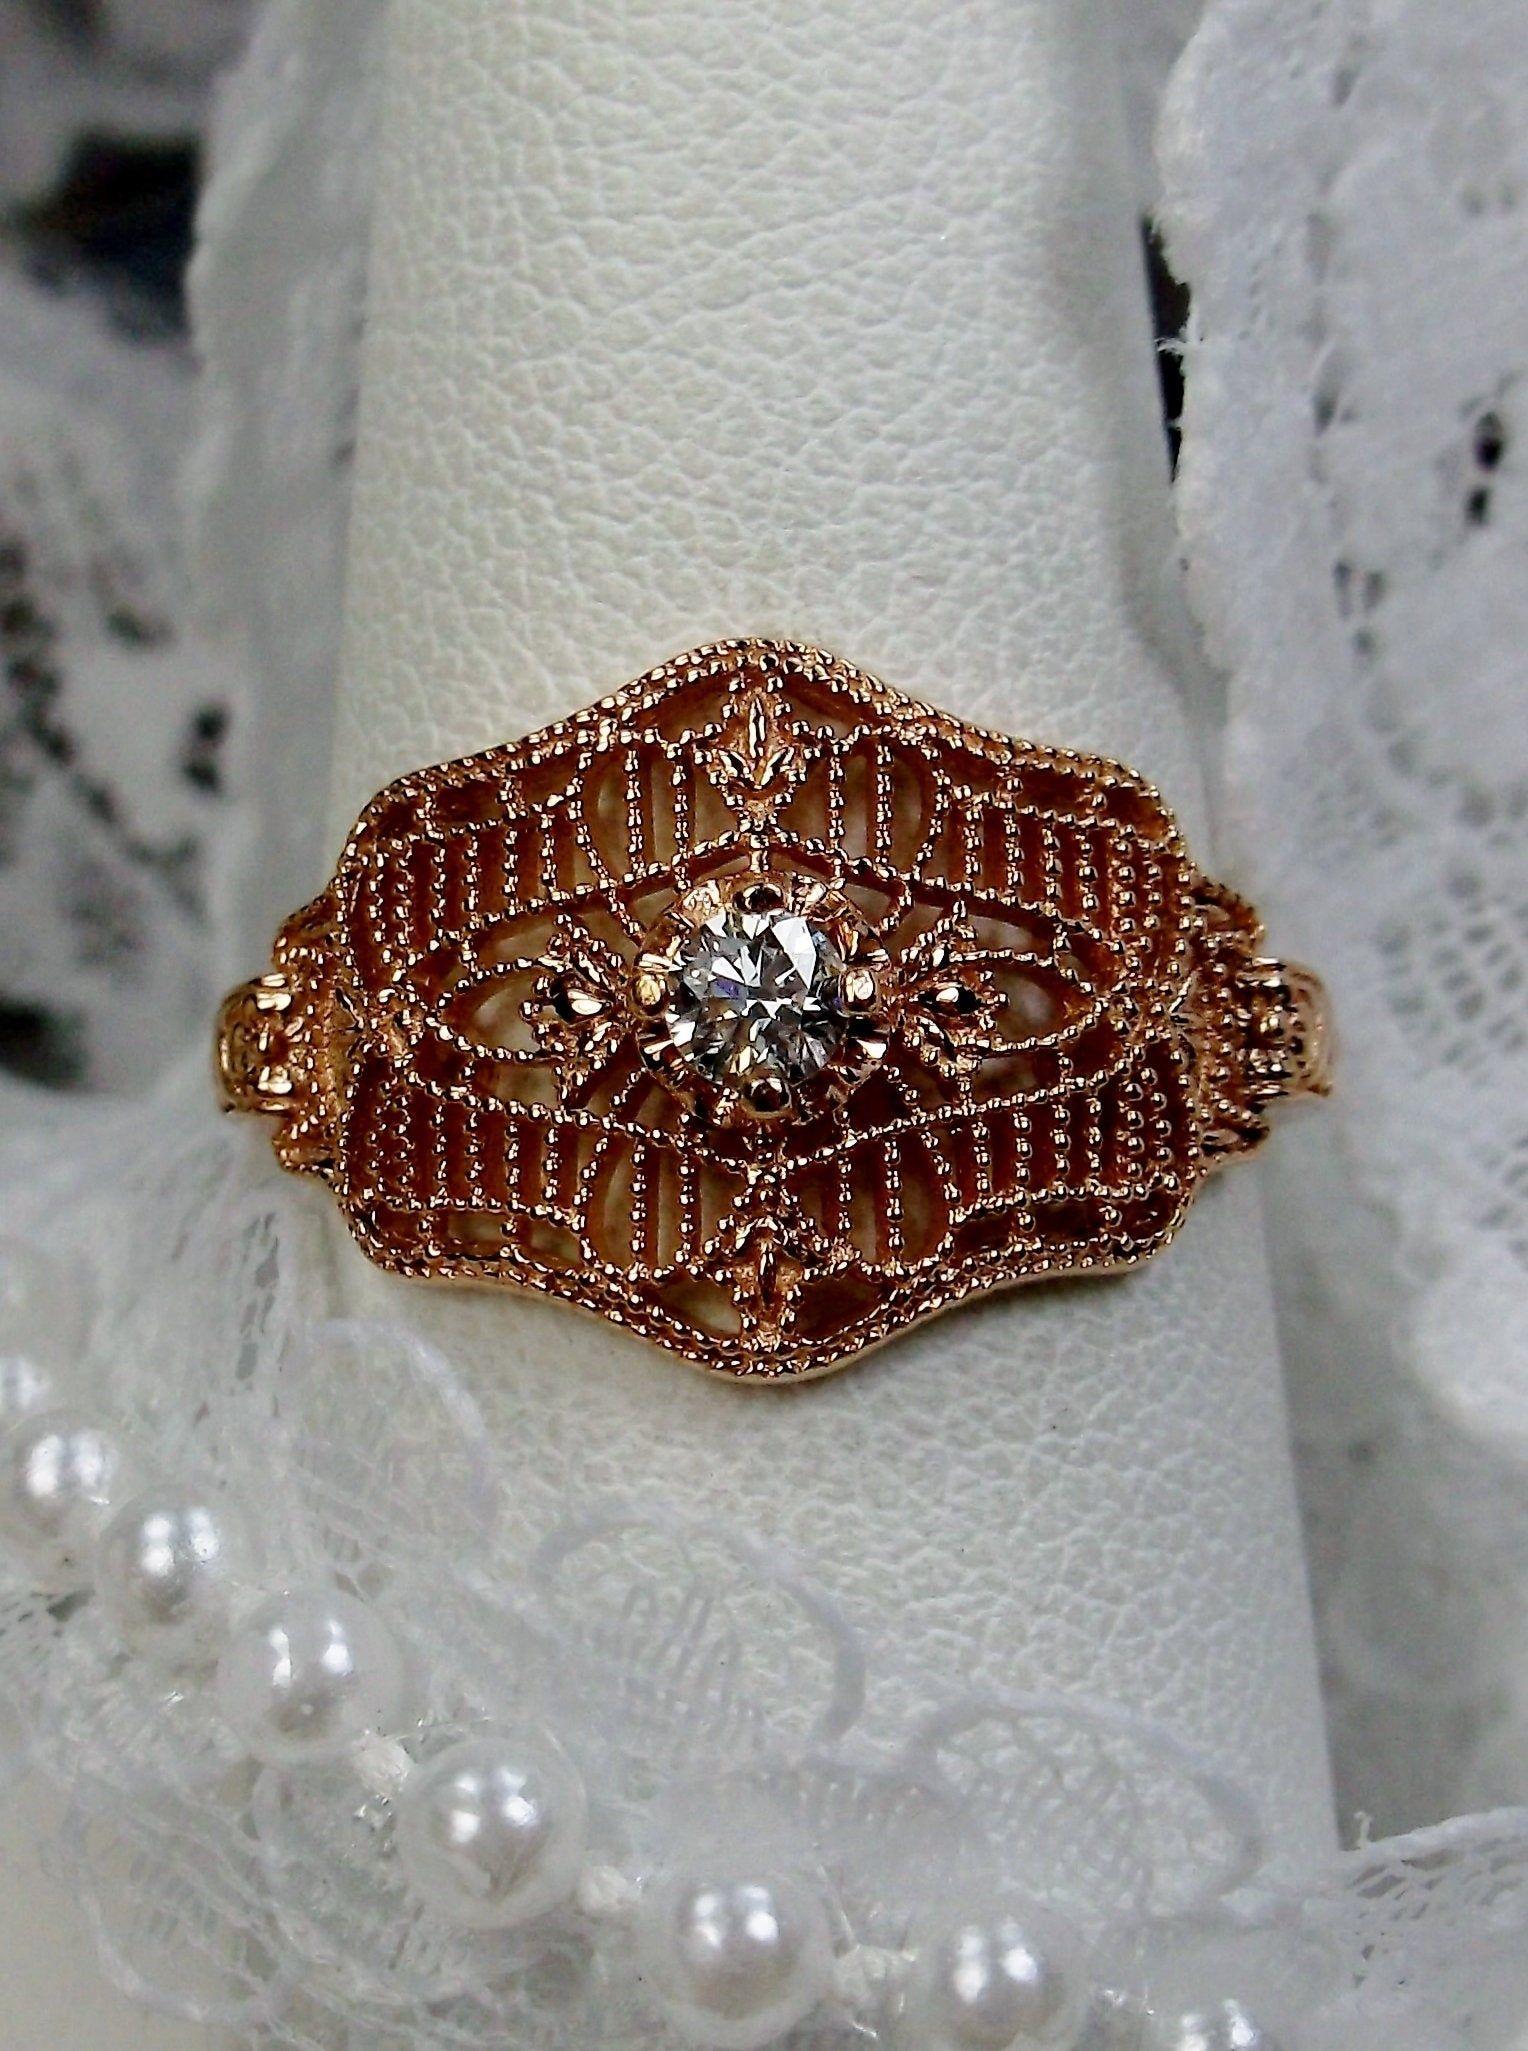 1pt Genuine Diamond Art Deco Victorian Solid 10k Solid Rose Gold Filigree Ring Size 6 5 Design 218 Diamond Art Filigree Ring Gold Antique Filigree Jewelry